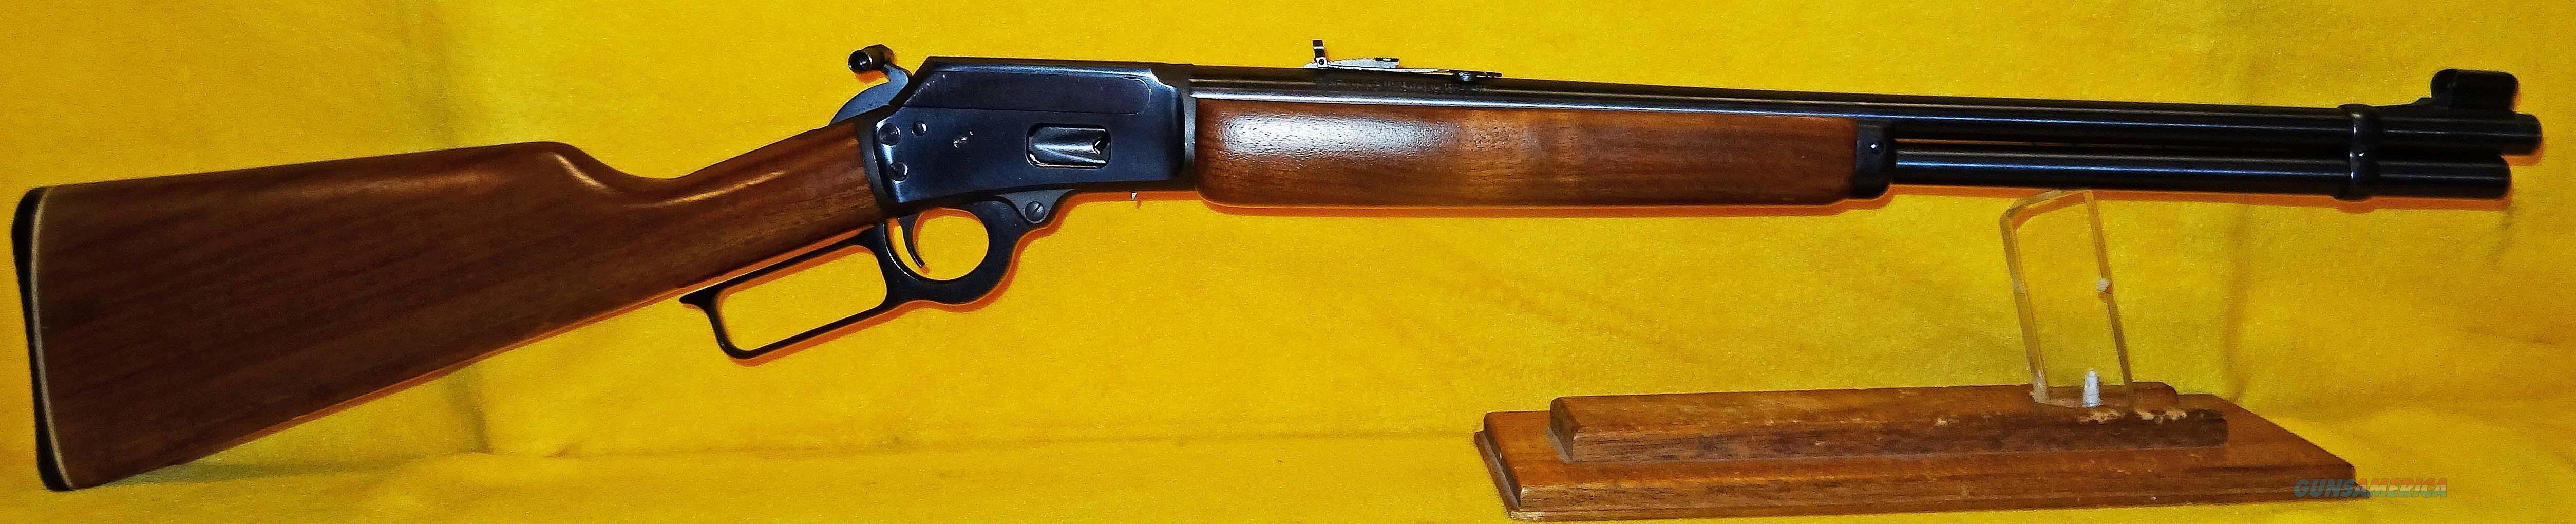 MARLIN 1894S  Guns > Rifles > Marlin Rifles > Modern > Lever Action